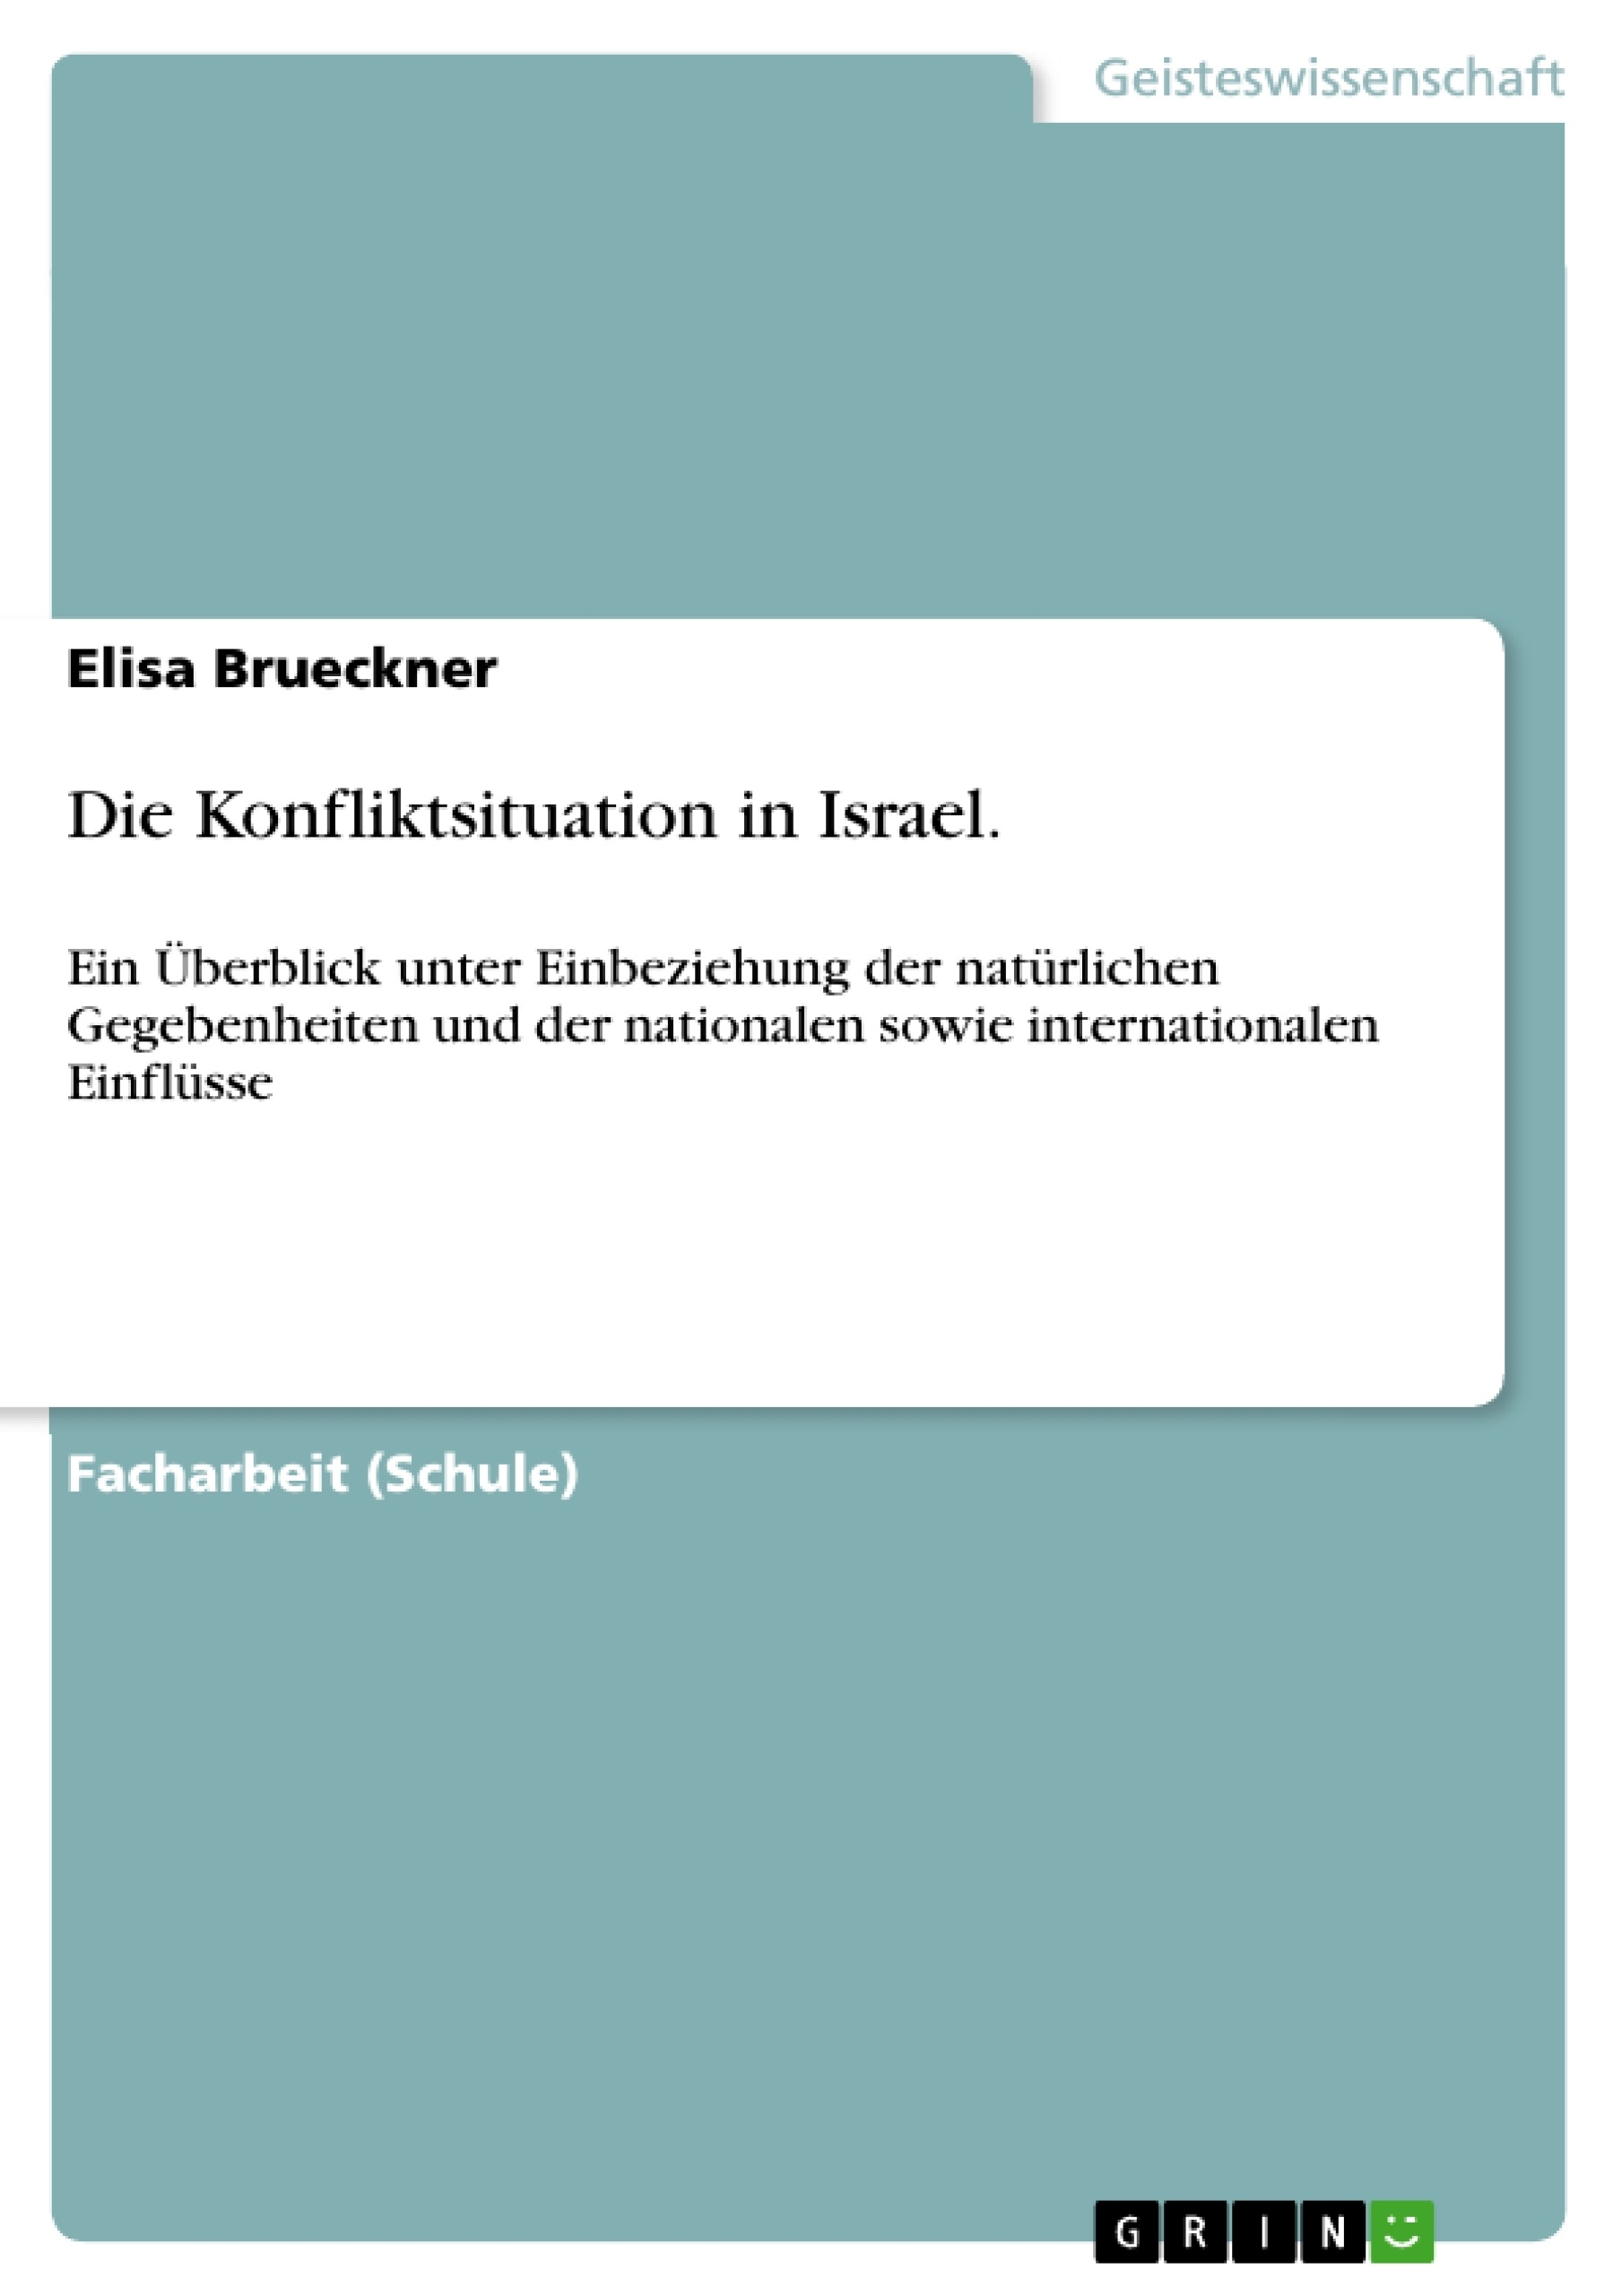 Titel: Die Konfliktsituation in Israel.